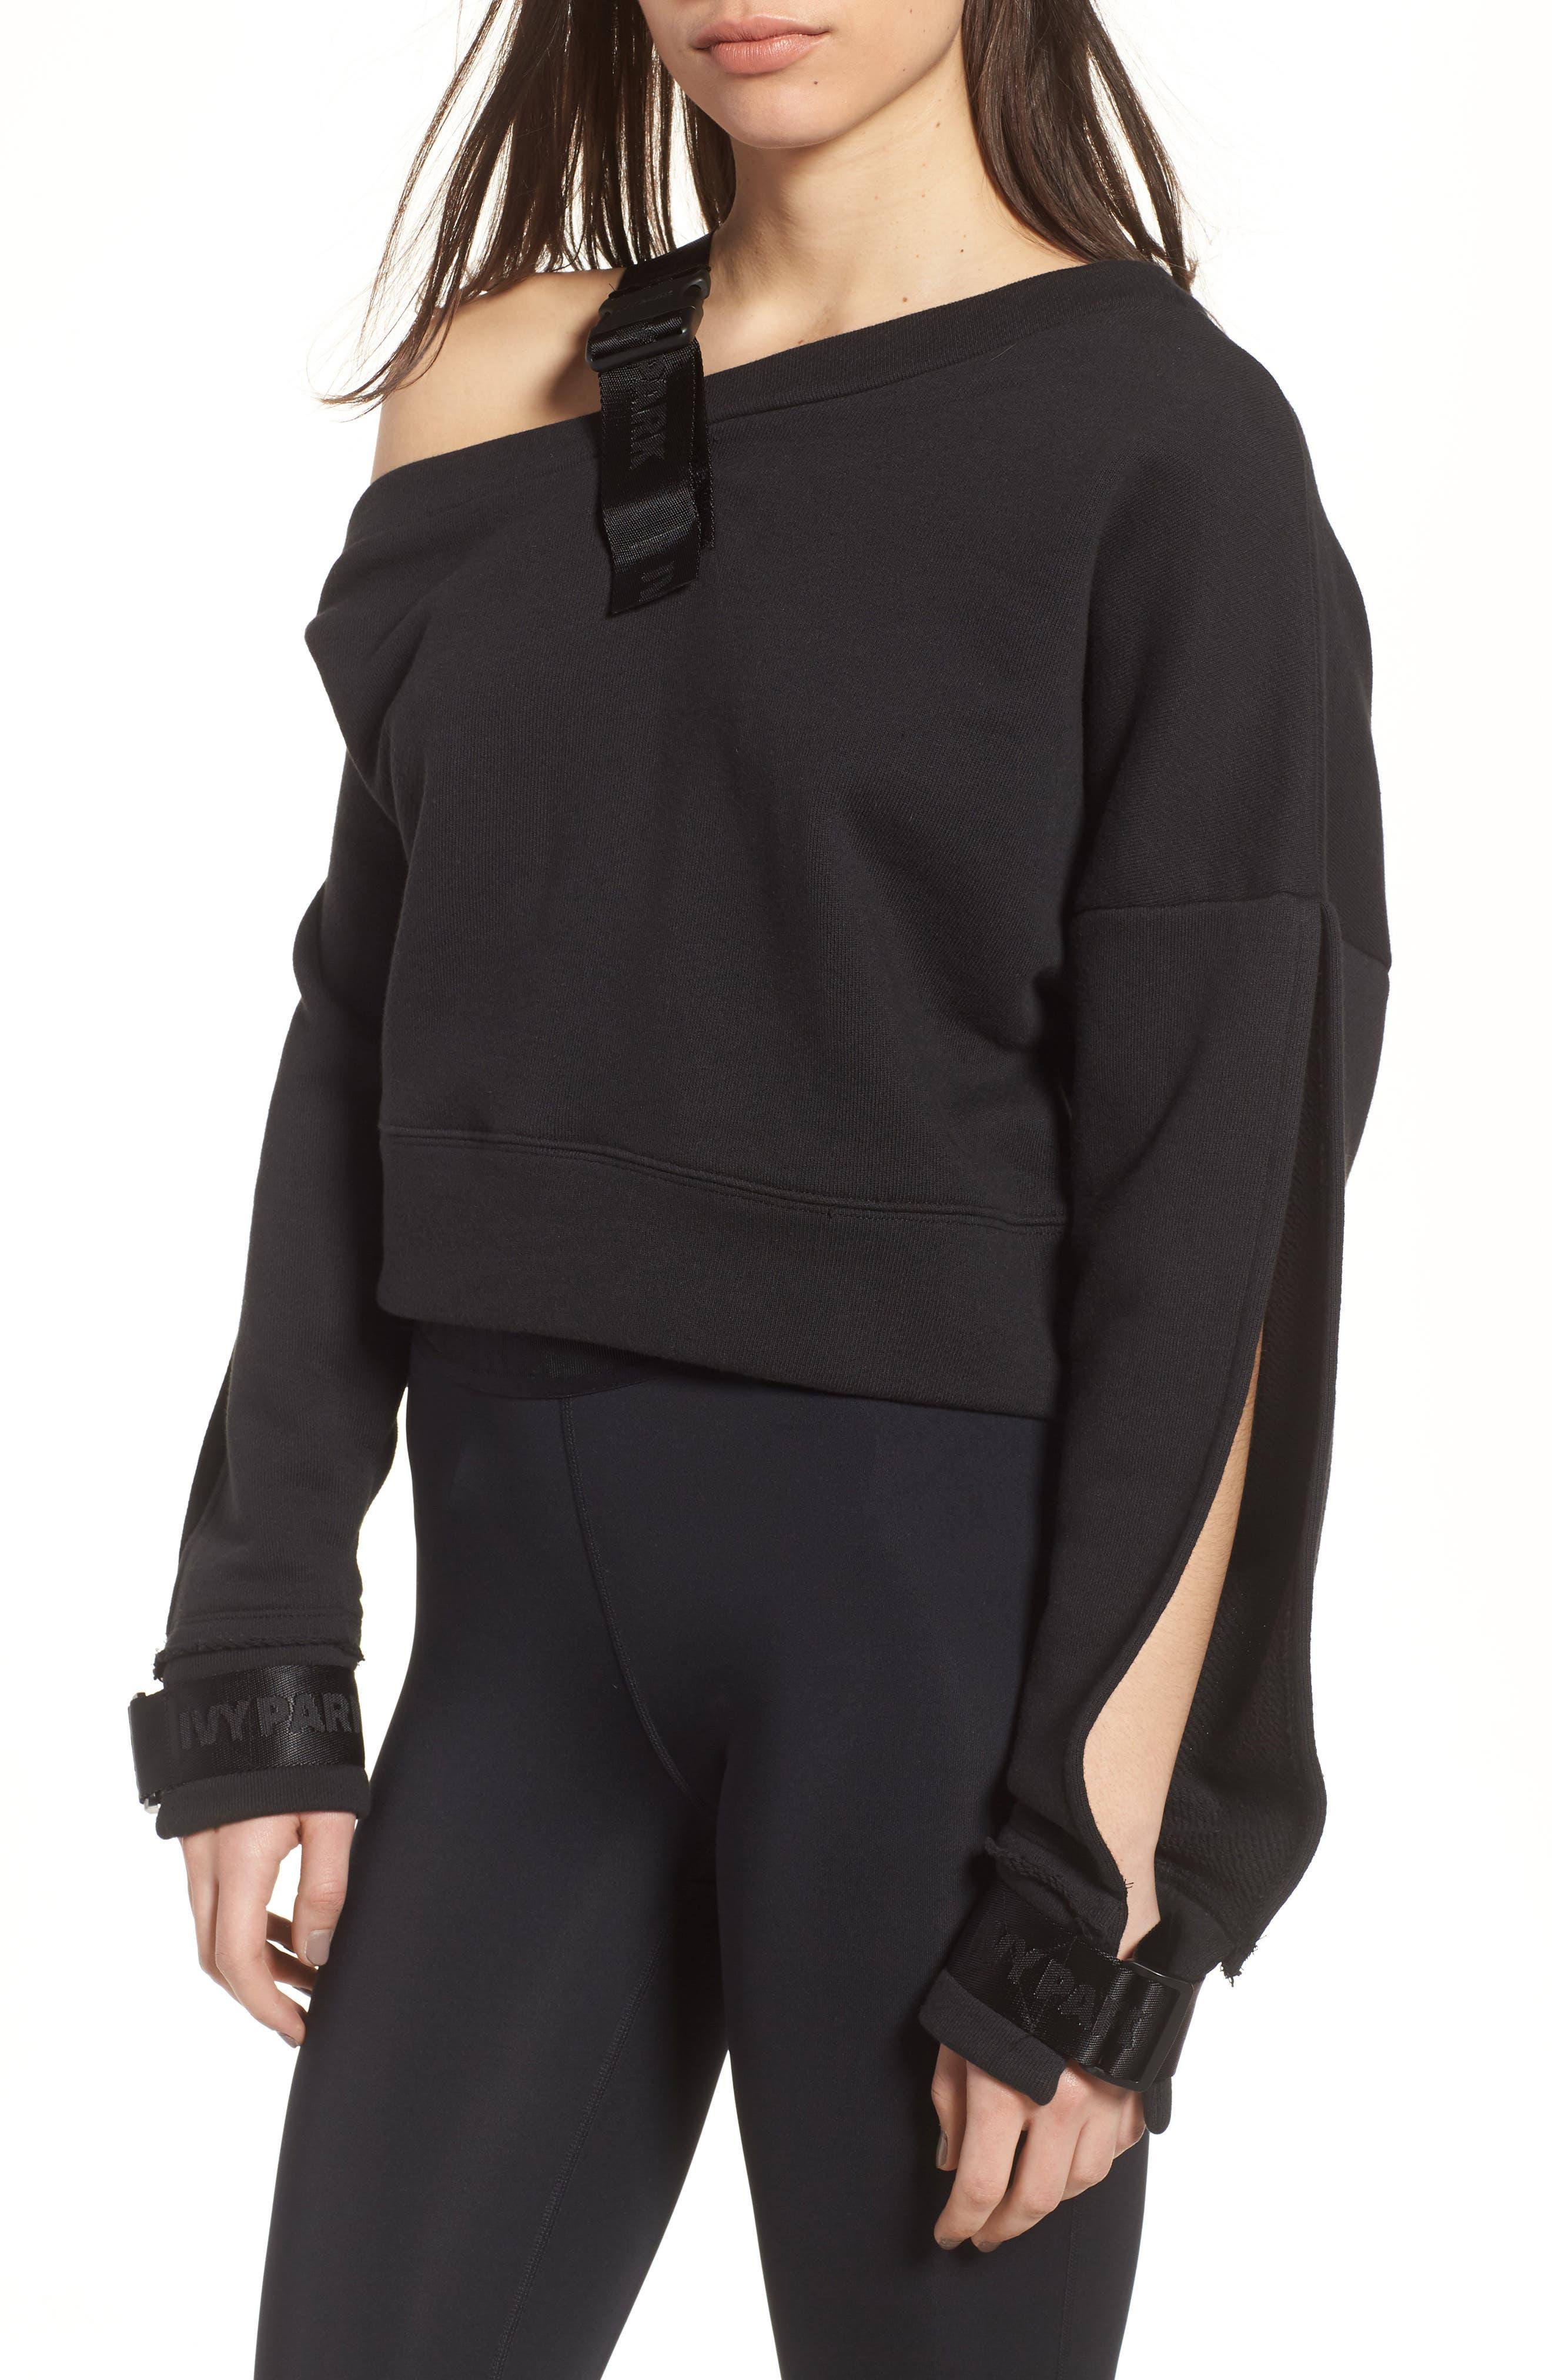 Harness Strap Sweatshirt,                             Main thumbnail 1, color,                             Black